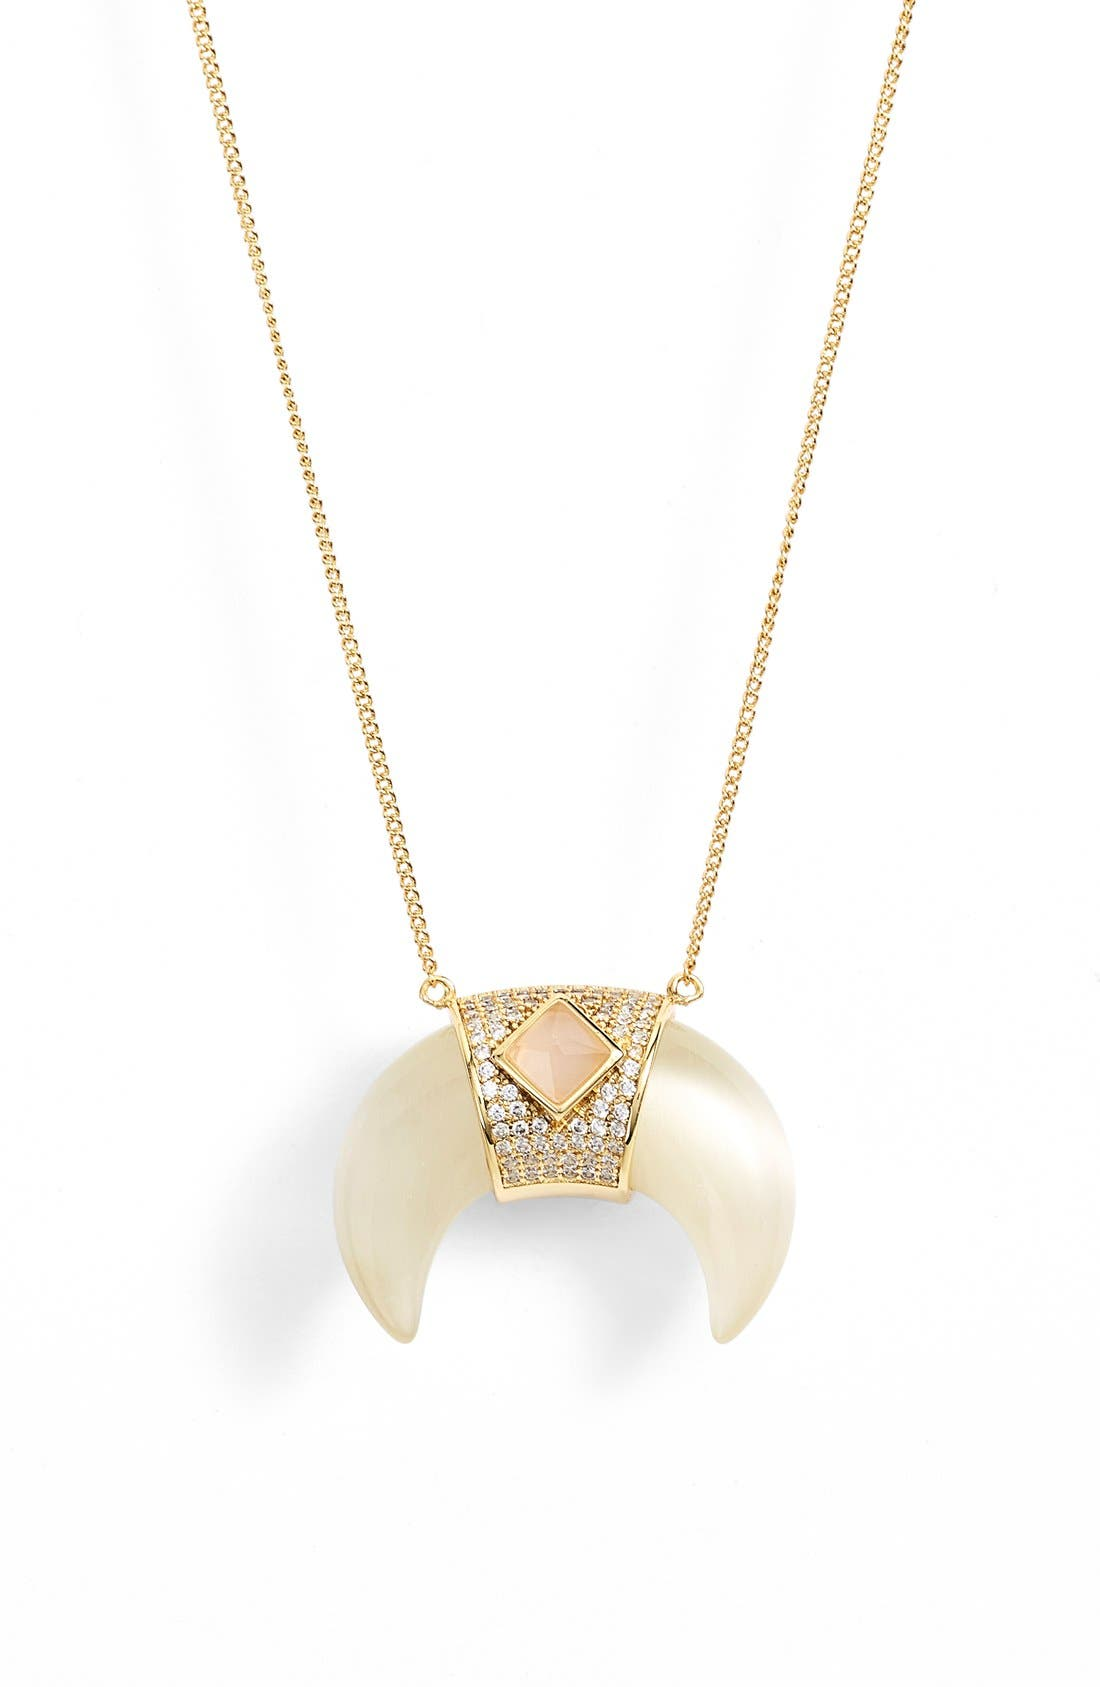 Alternate Image 1 Selected - Melanie AuldPavé Tusk Pendant Necklace